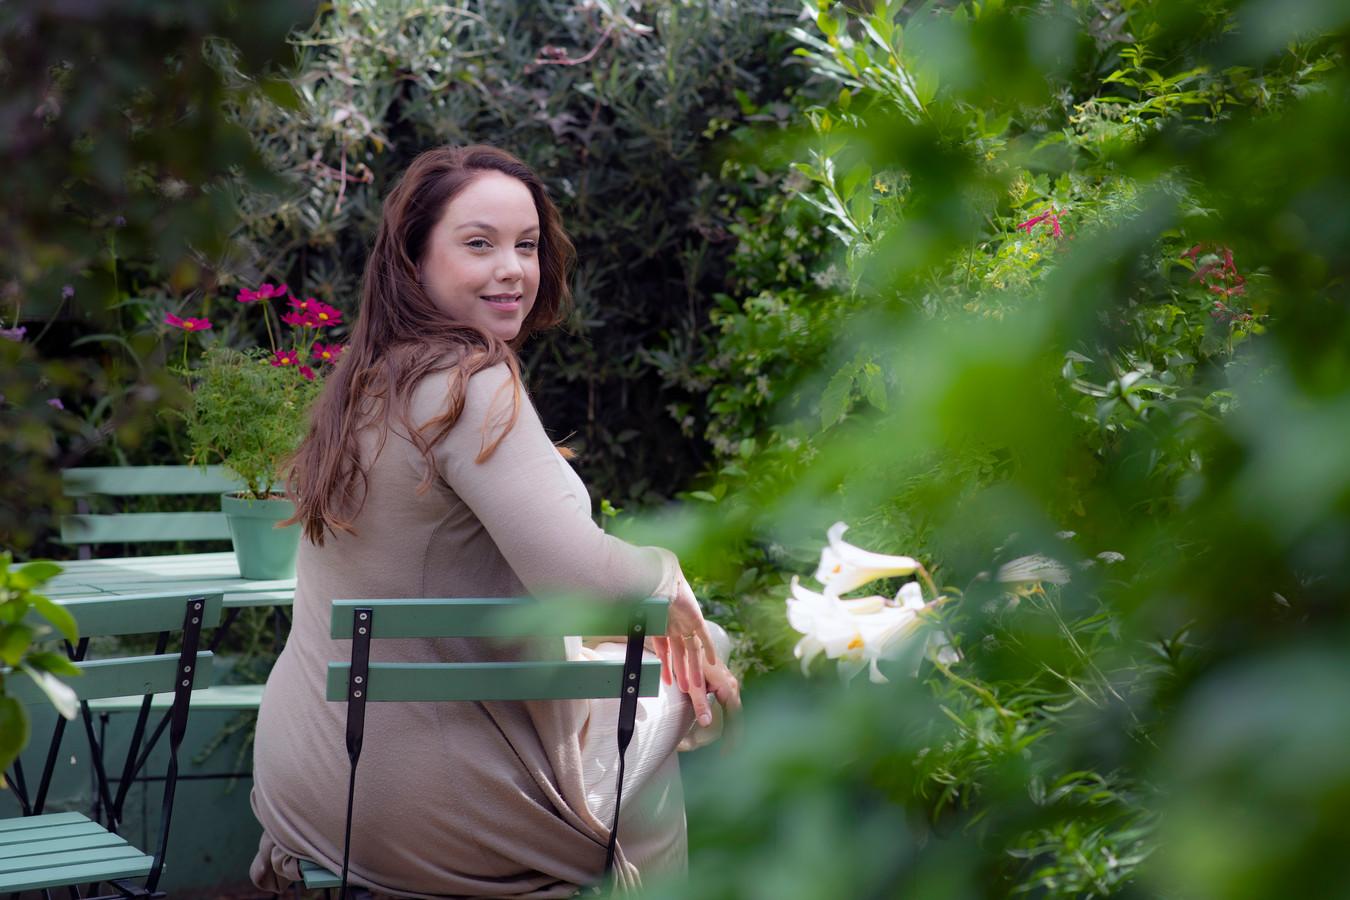 Tuinvrouw Anne Wieggers in haar duurzame tuin